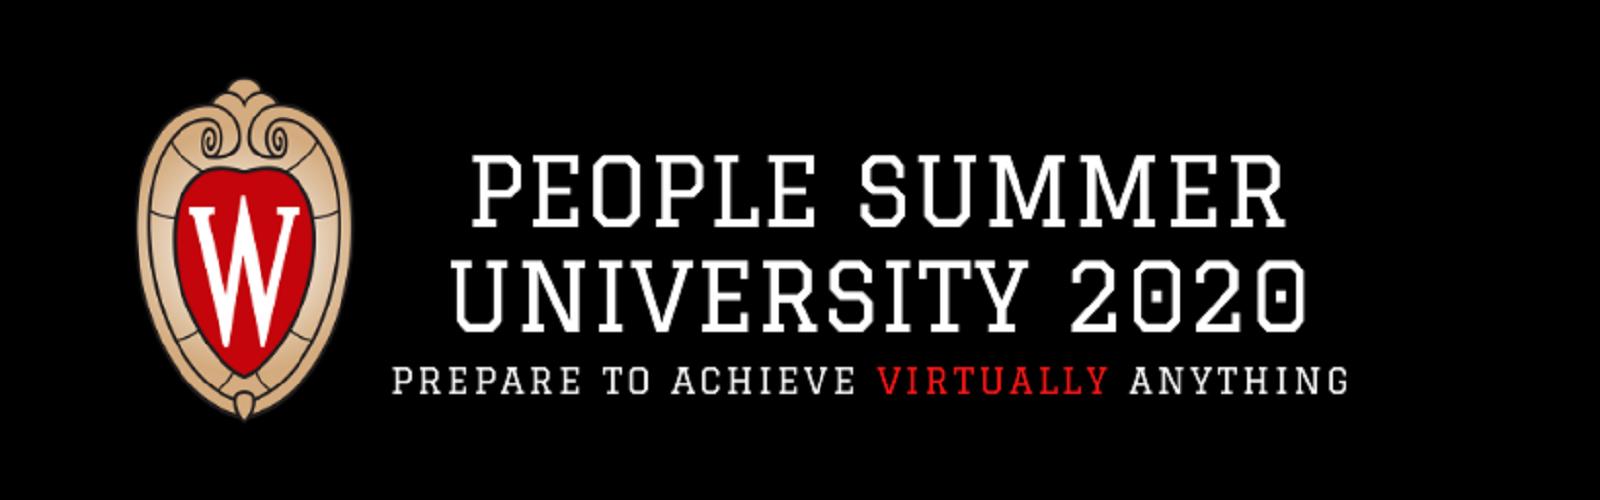 Virtual University Image